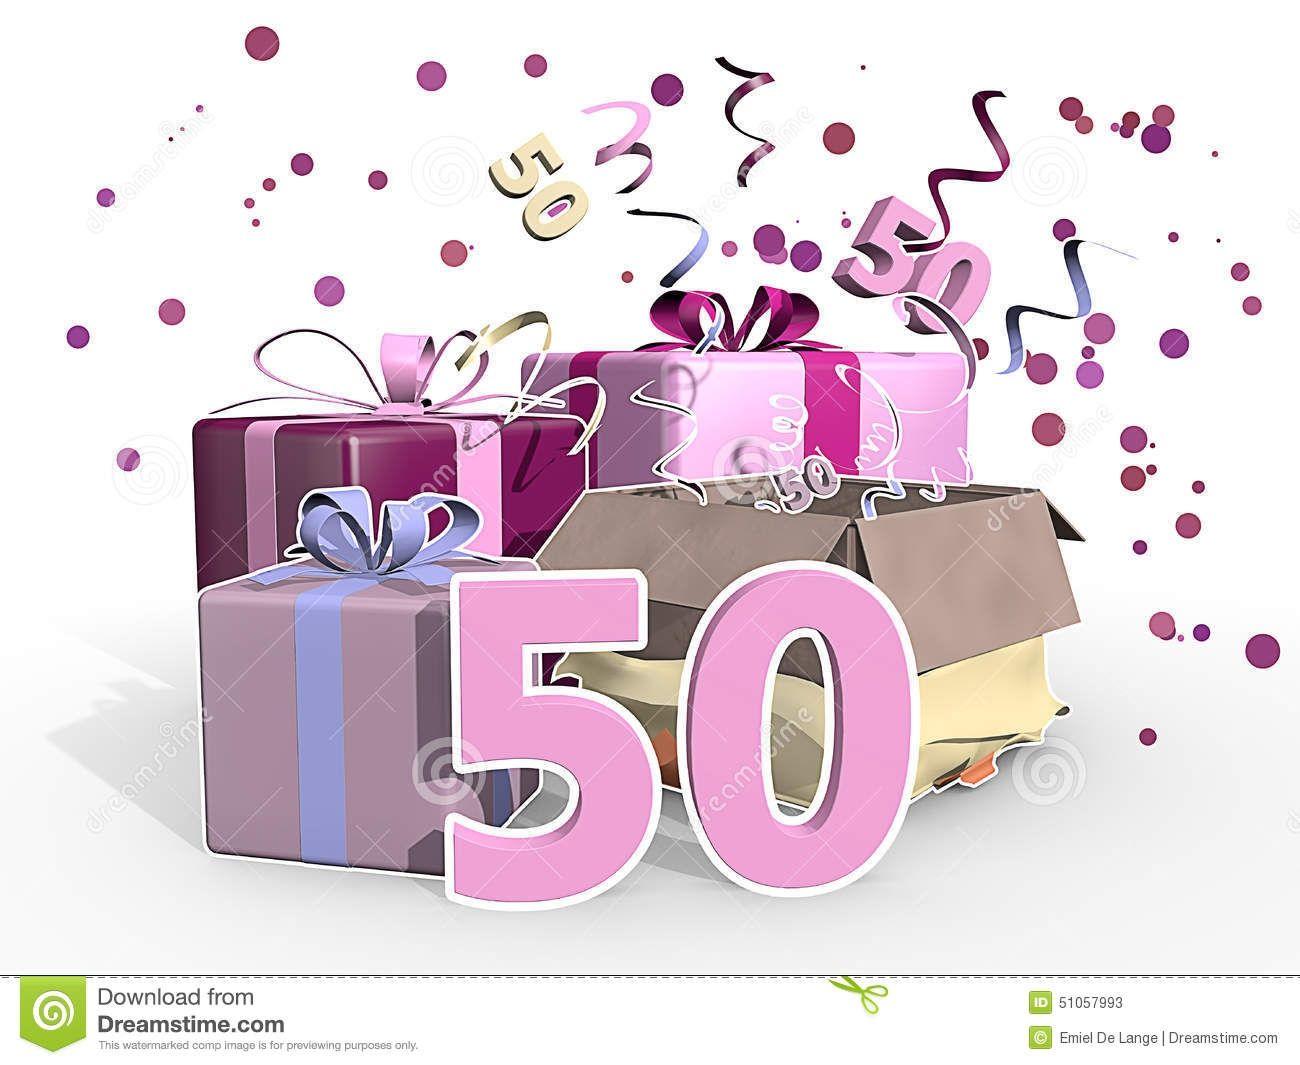 Tarjetas de cumplea os 50 mujer en hd gratis 2 hd - Ideas 50 cumpleanos ...